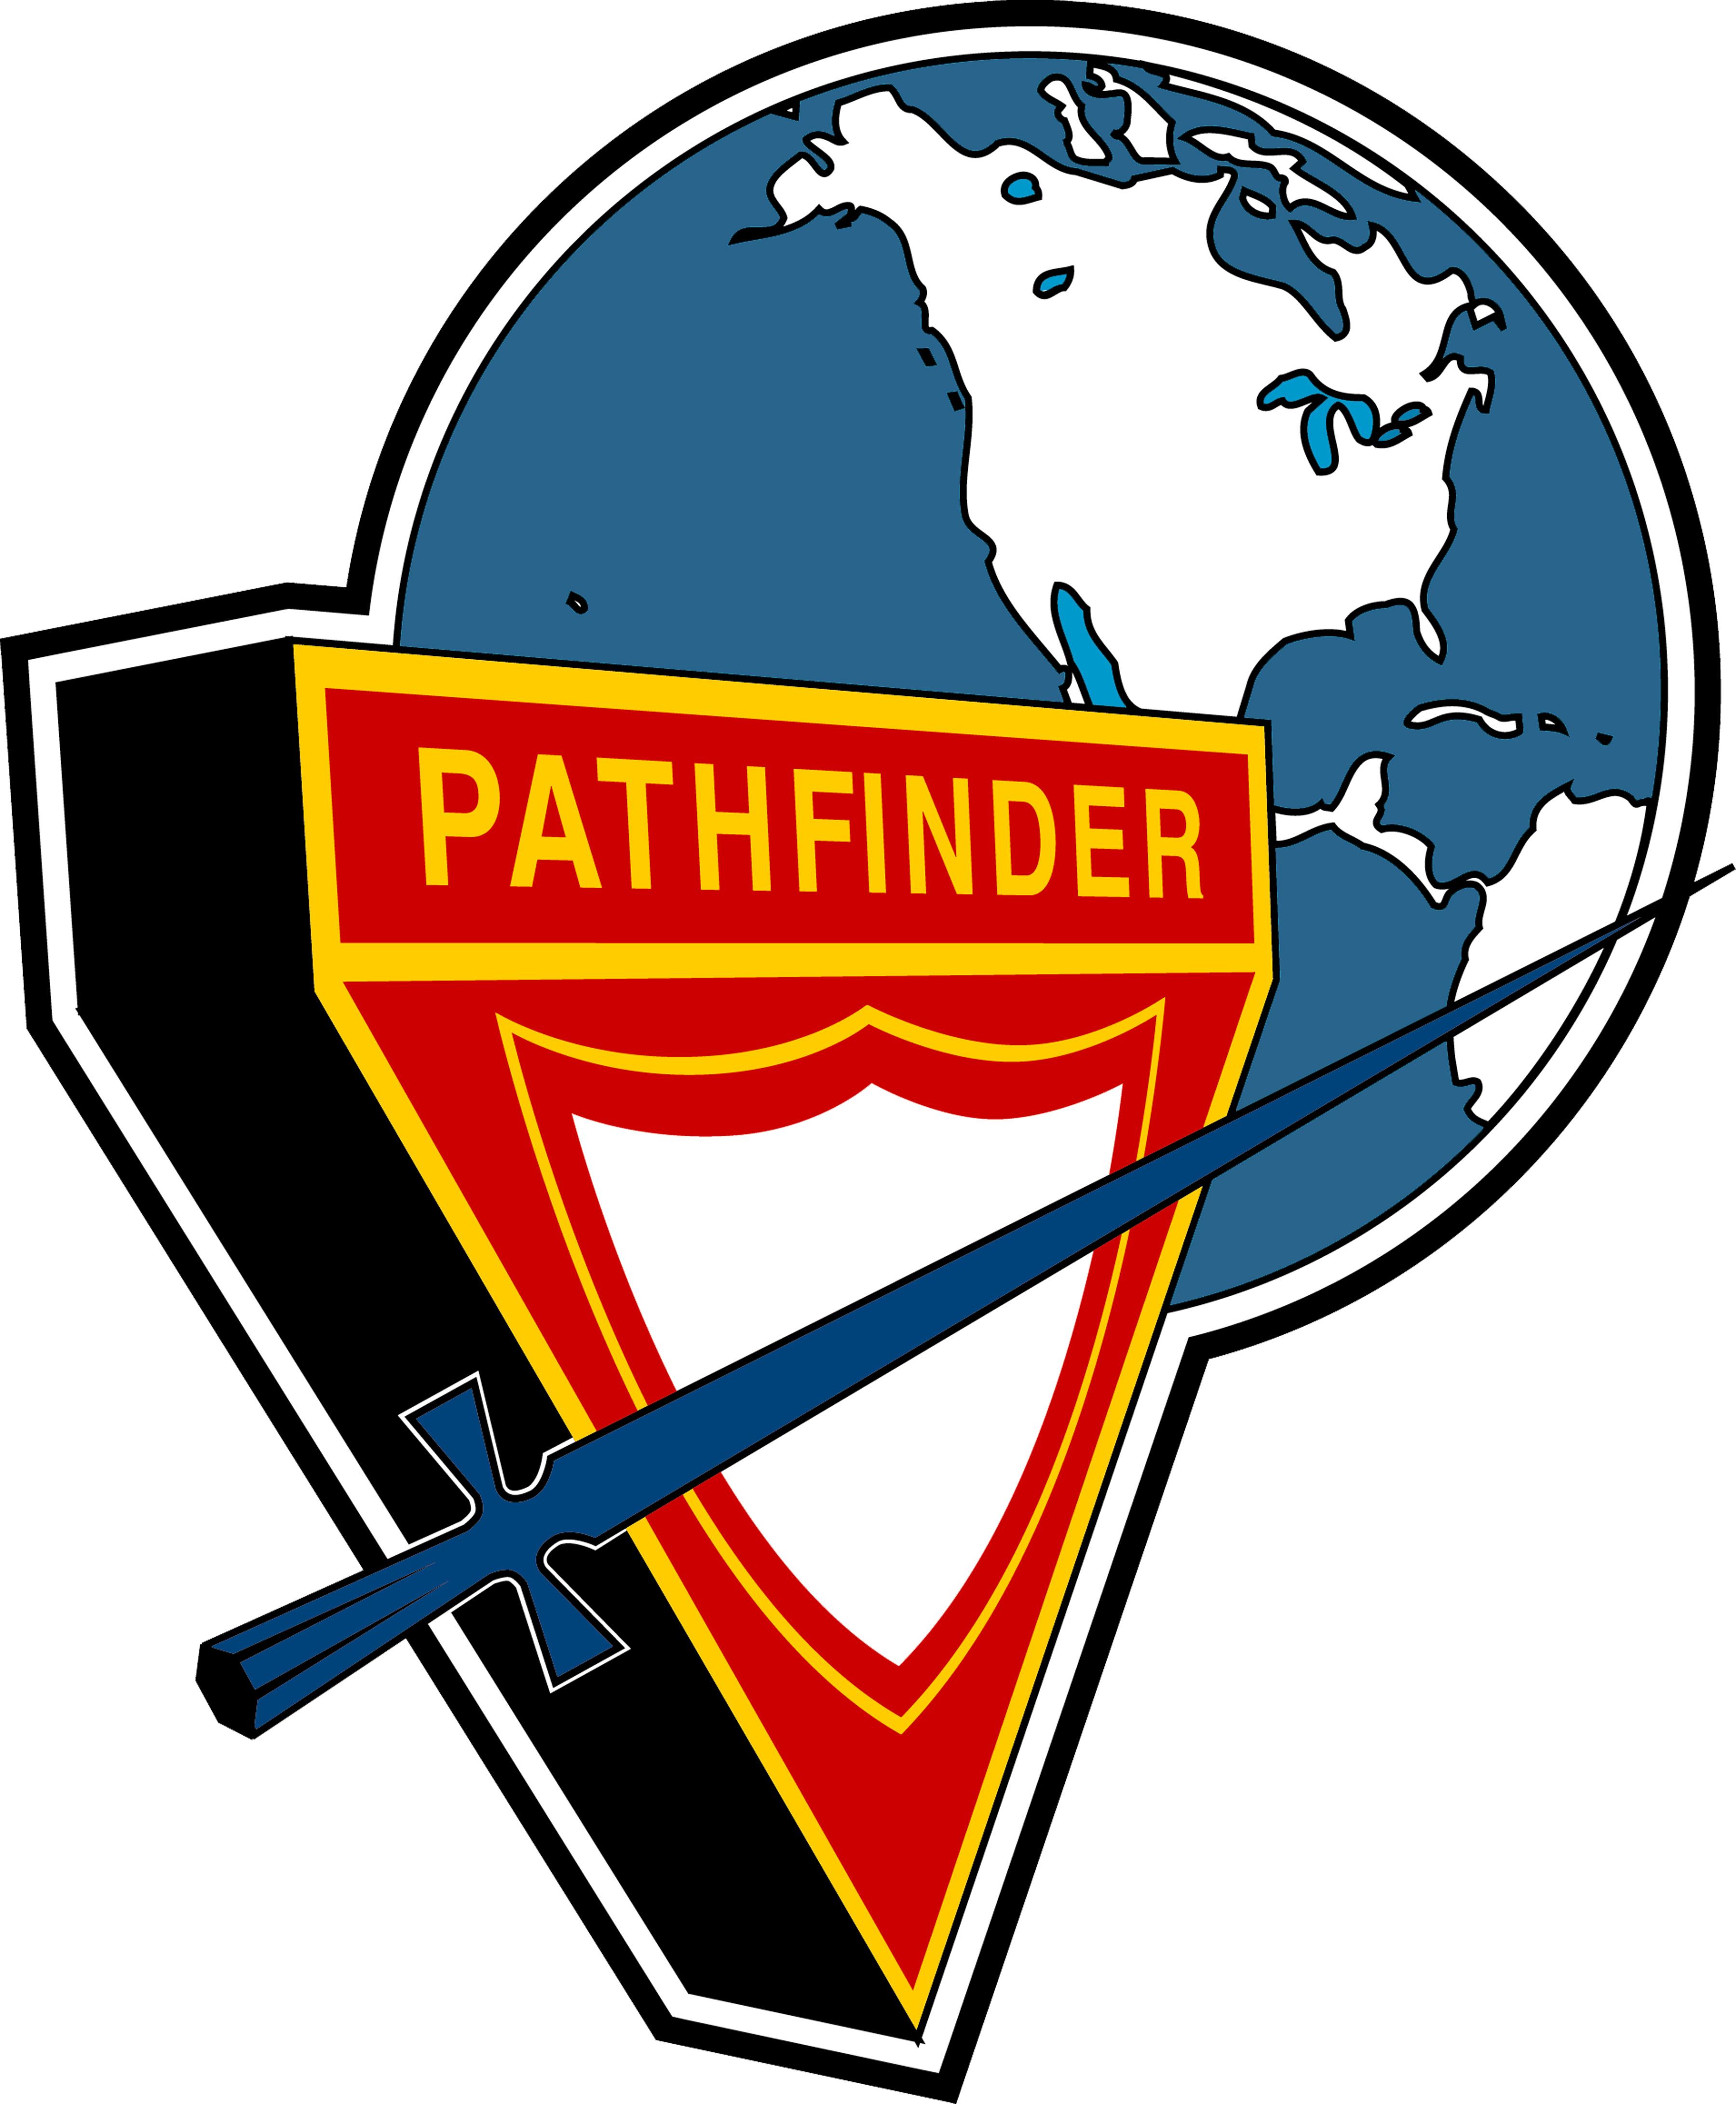 Pathfinder Club Logos Adventist Youth Ministries Nad